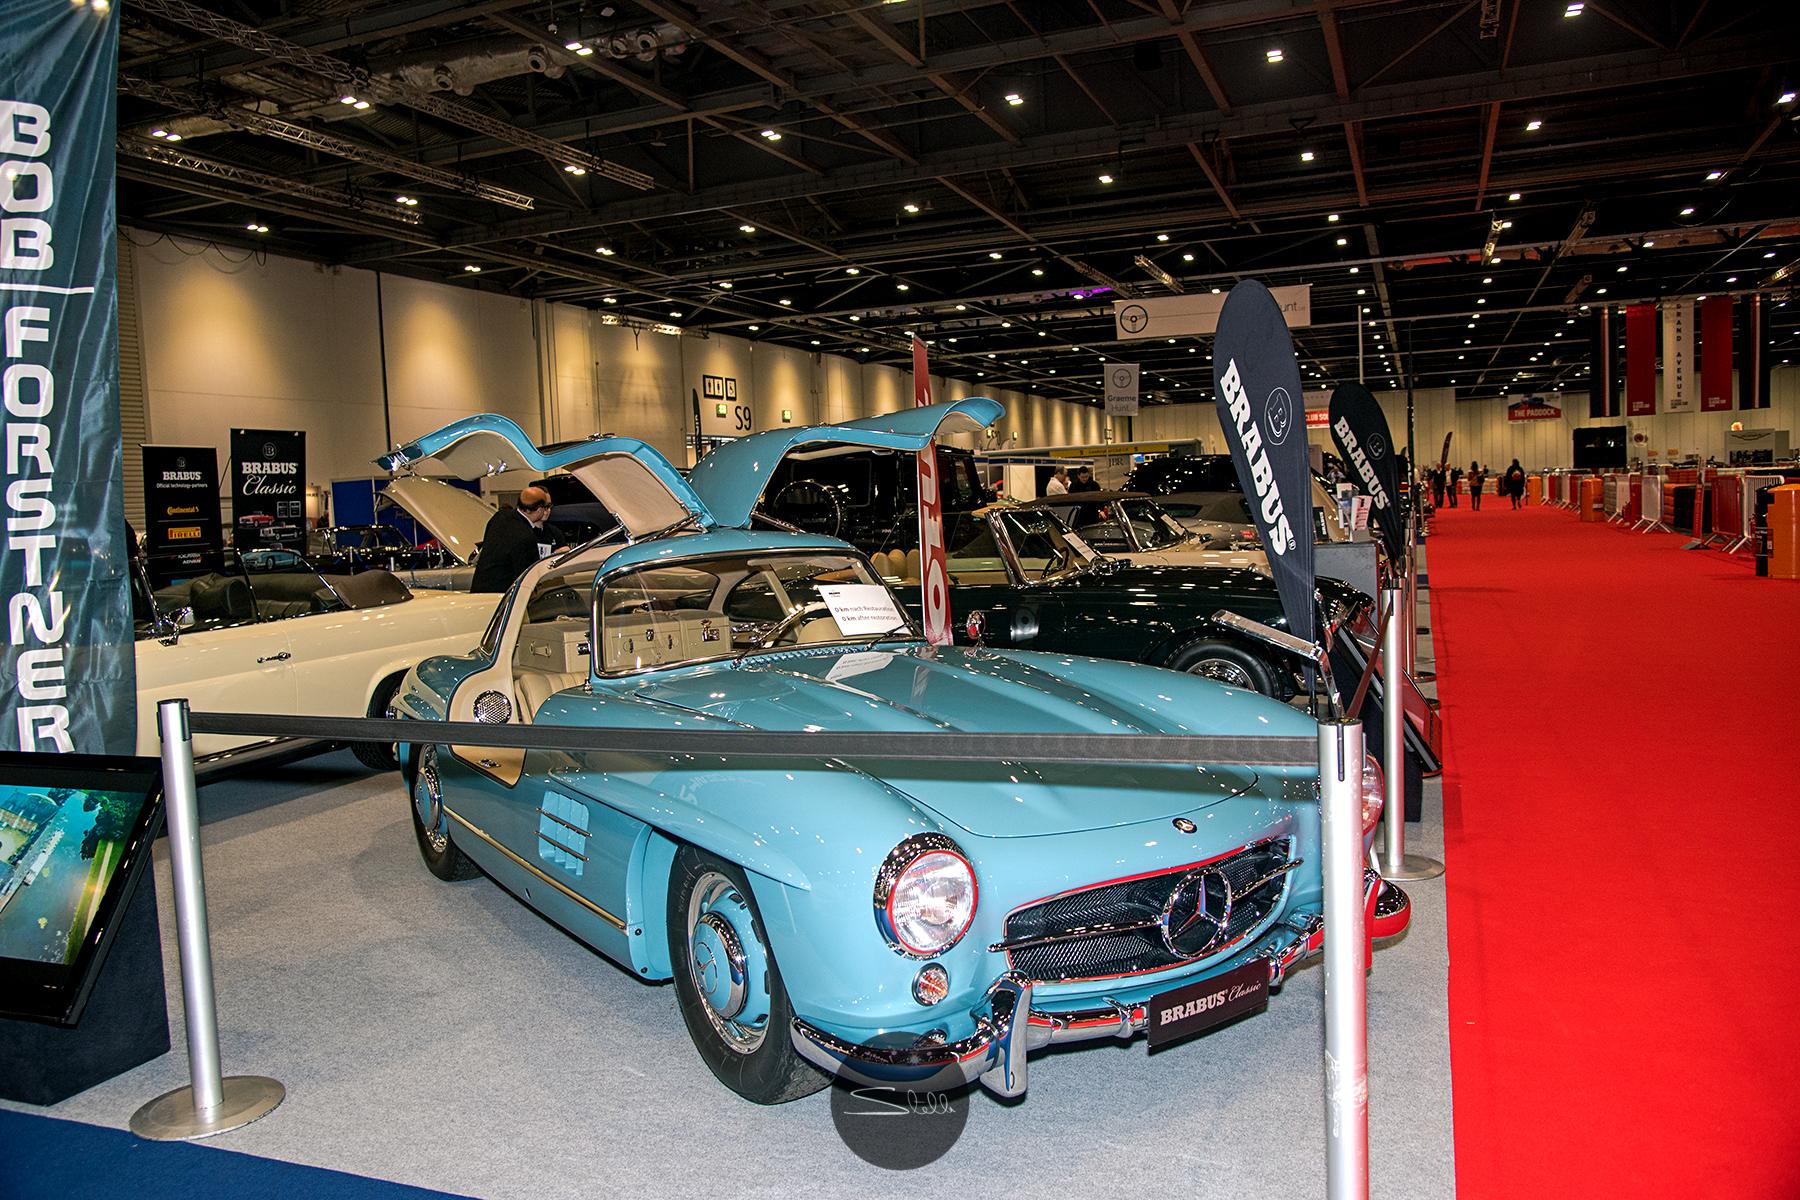 Stella Scordellis London Classic Car Show 2018 4 Watermarked.jpg